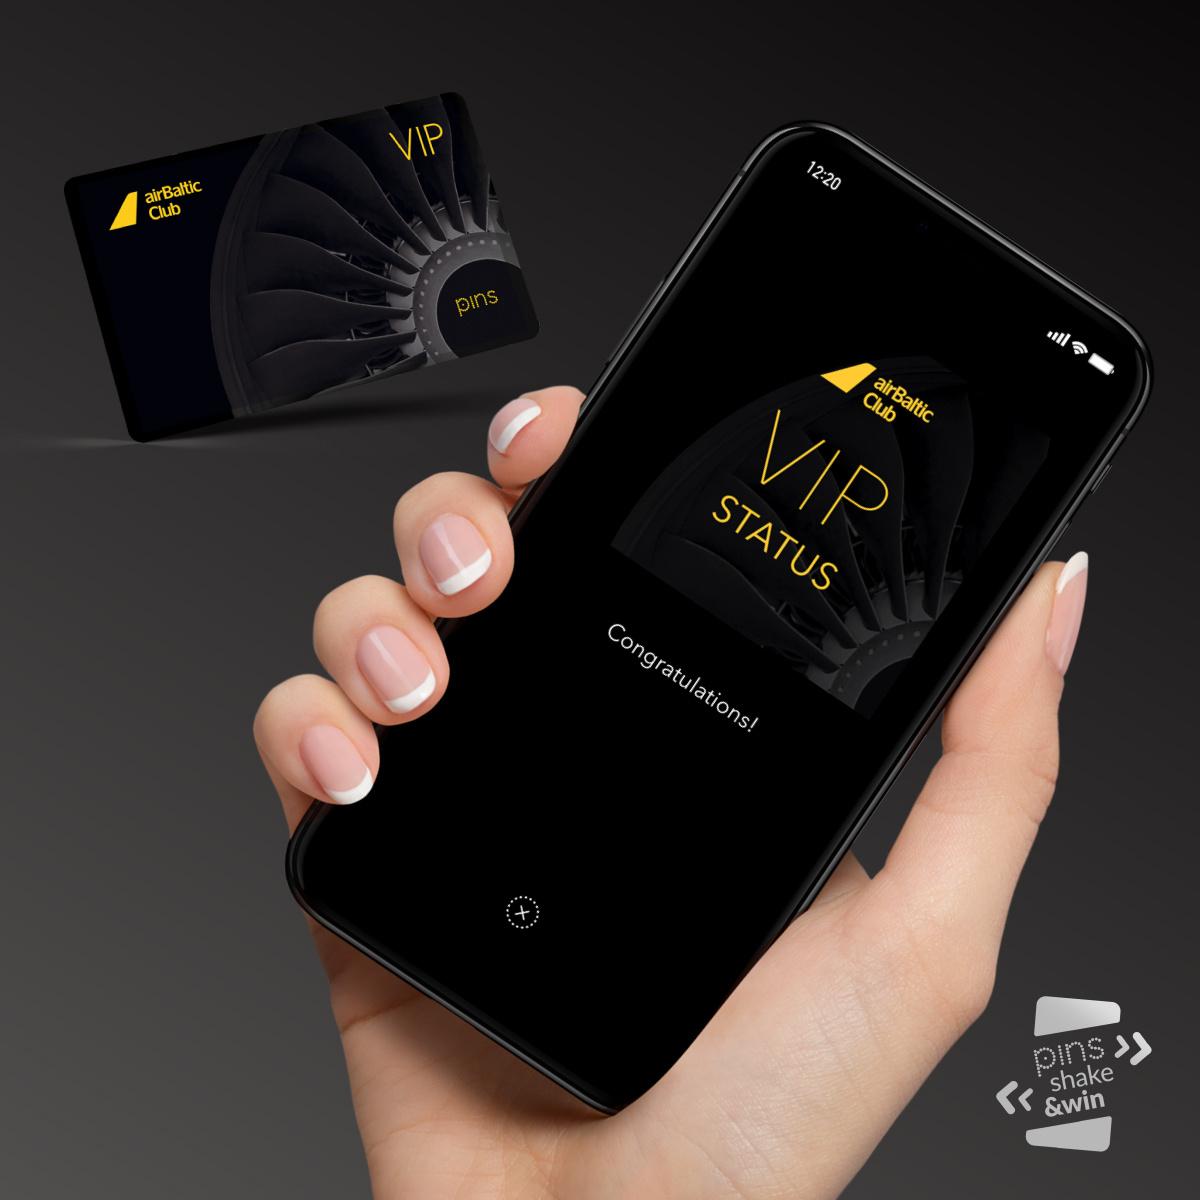 Participate in airBaltic Club Shake&Win and win VIP status image